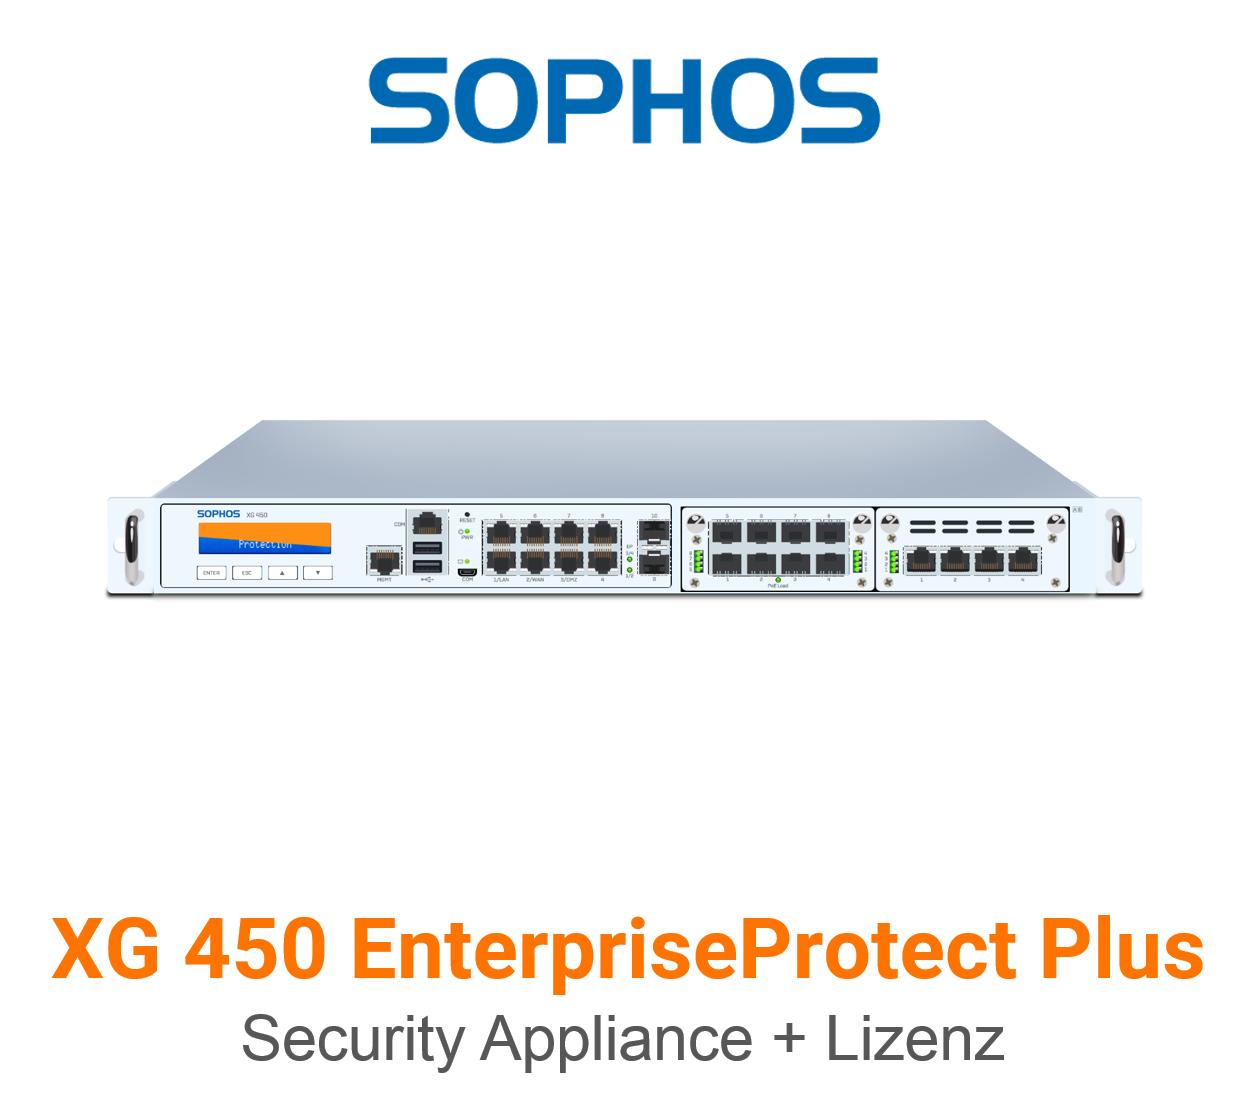 Sophos XG 450 EnterpriseProtect Plus Bundle (Hardware + Lizenz)